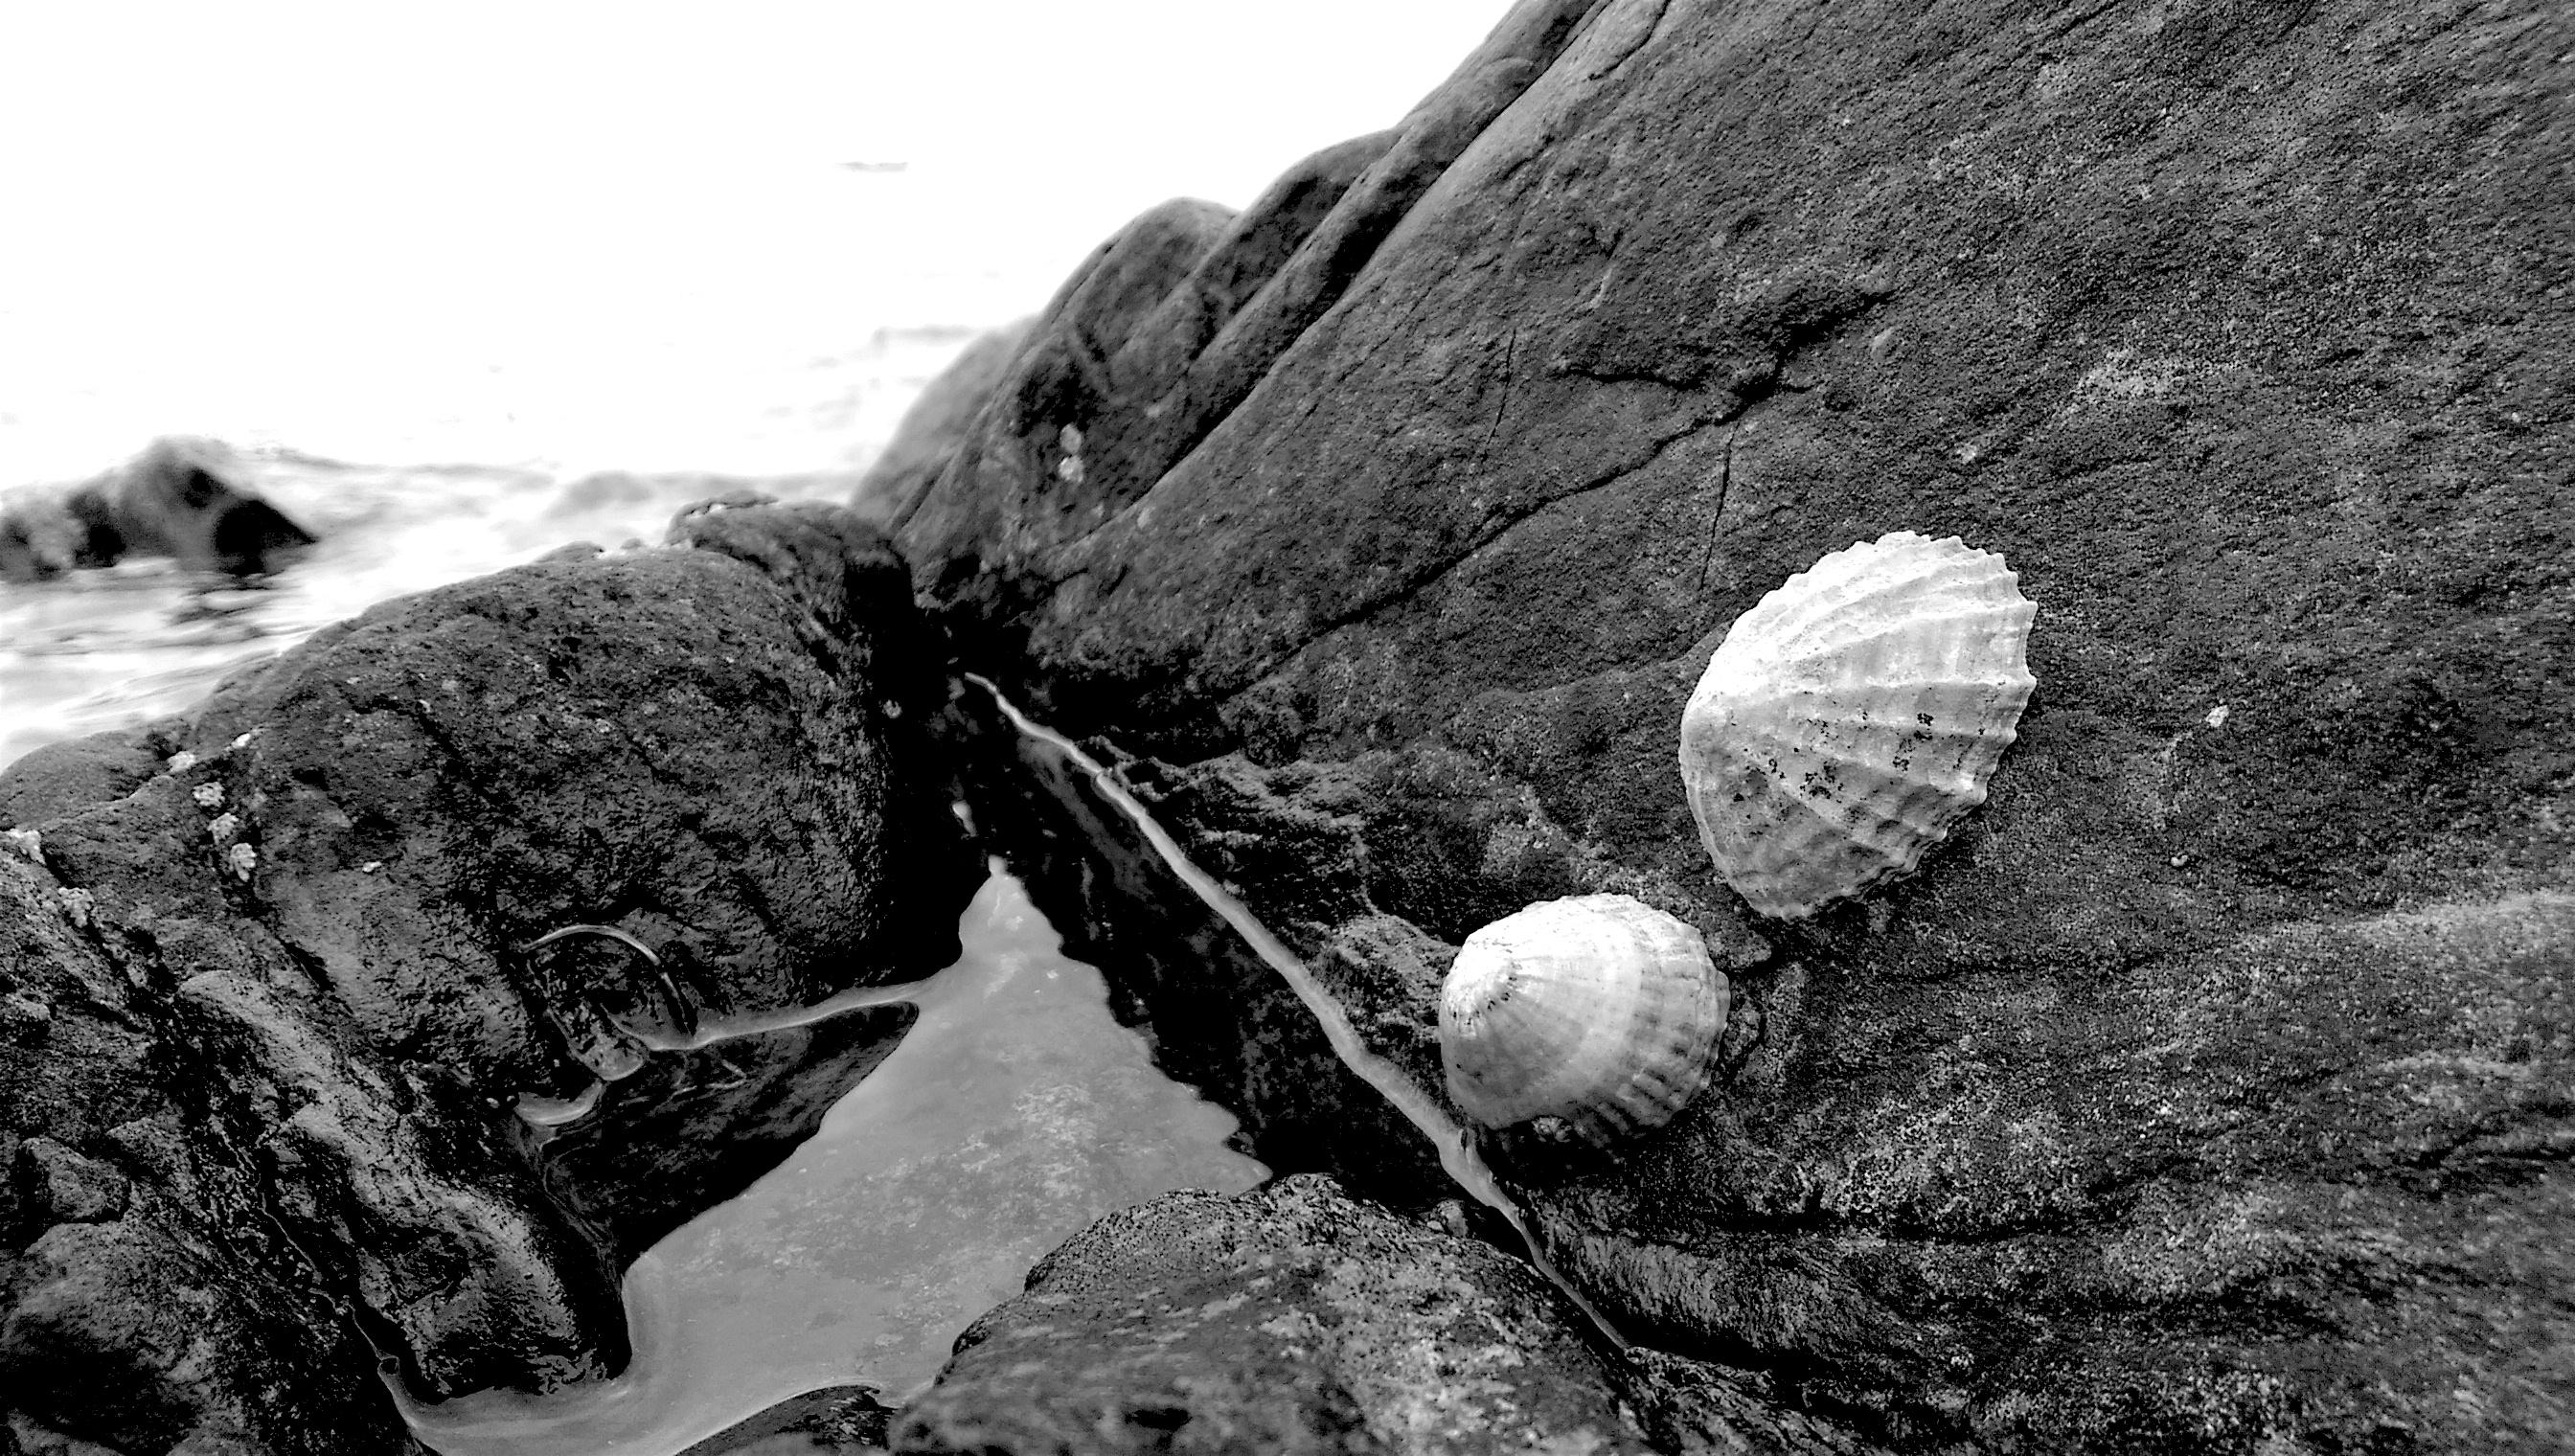 Muscheln auf Felsen